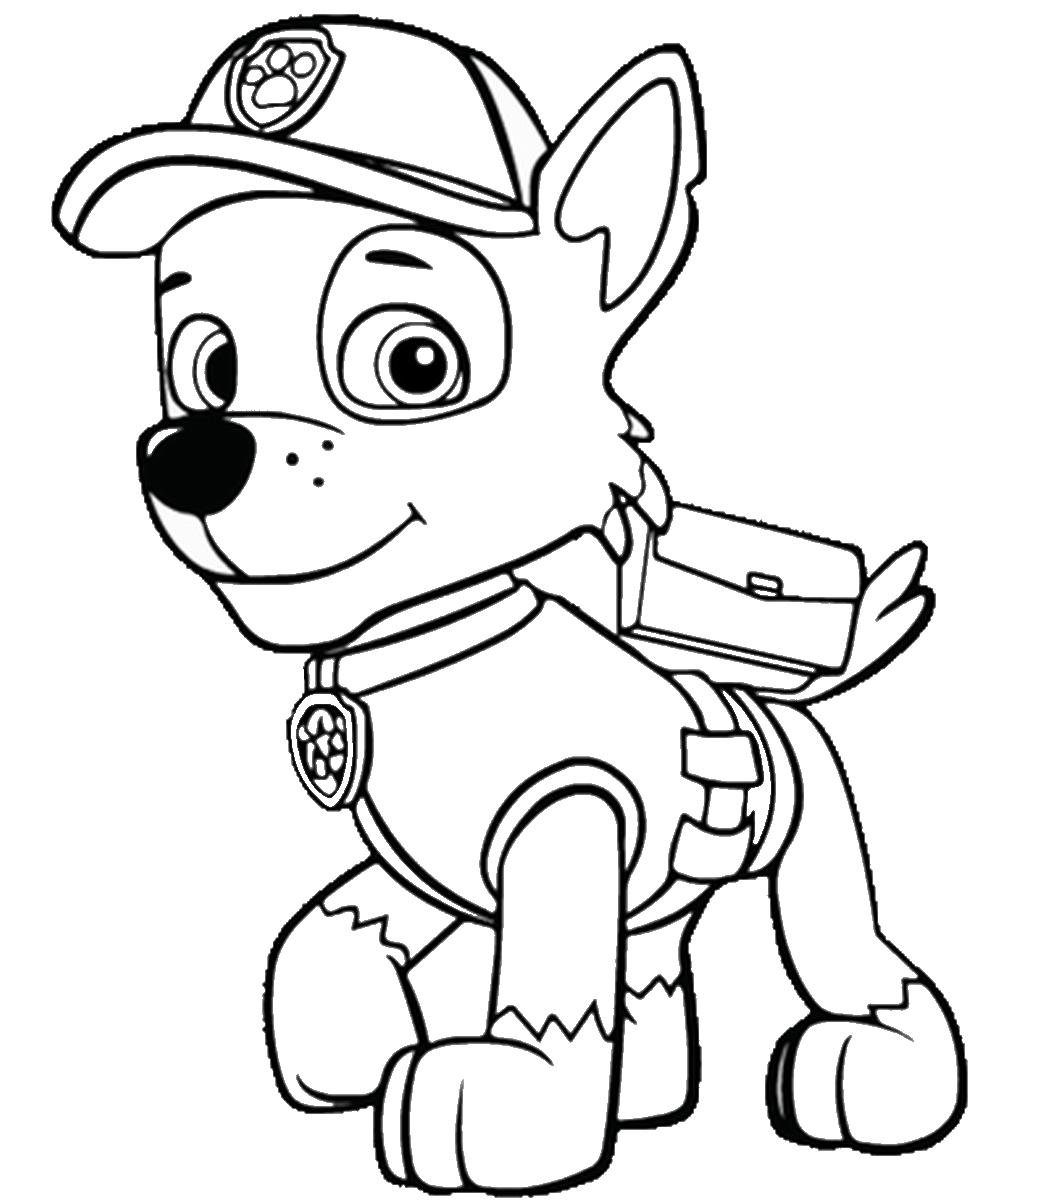 paw patrol coloring book paw patrol coloring pages patrol book coloring paw